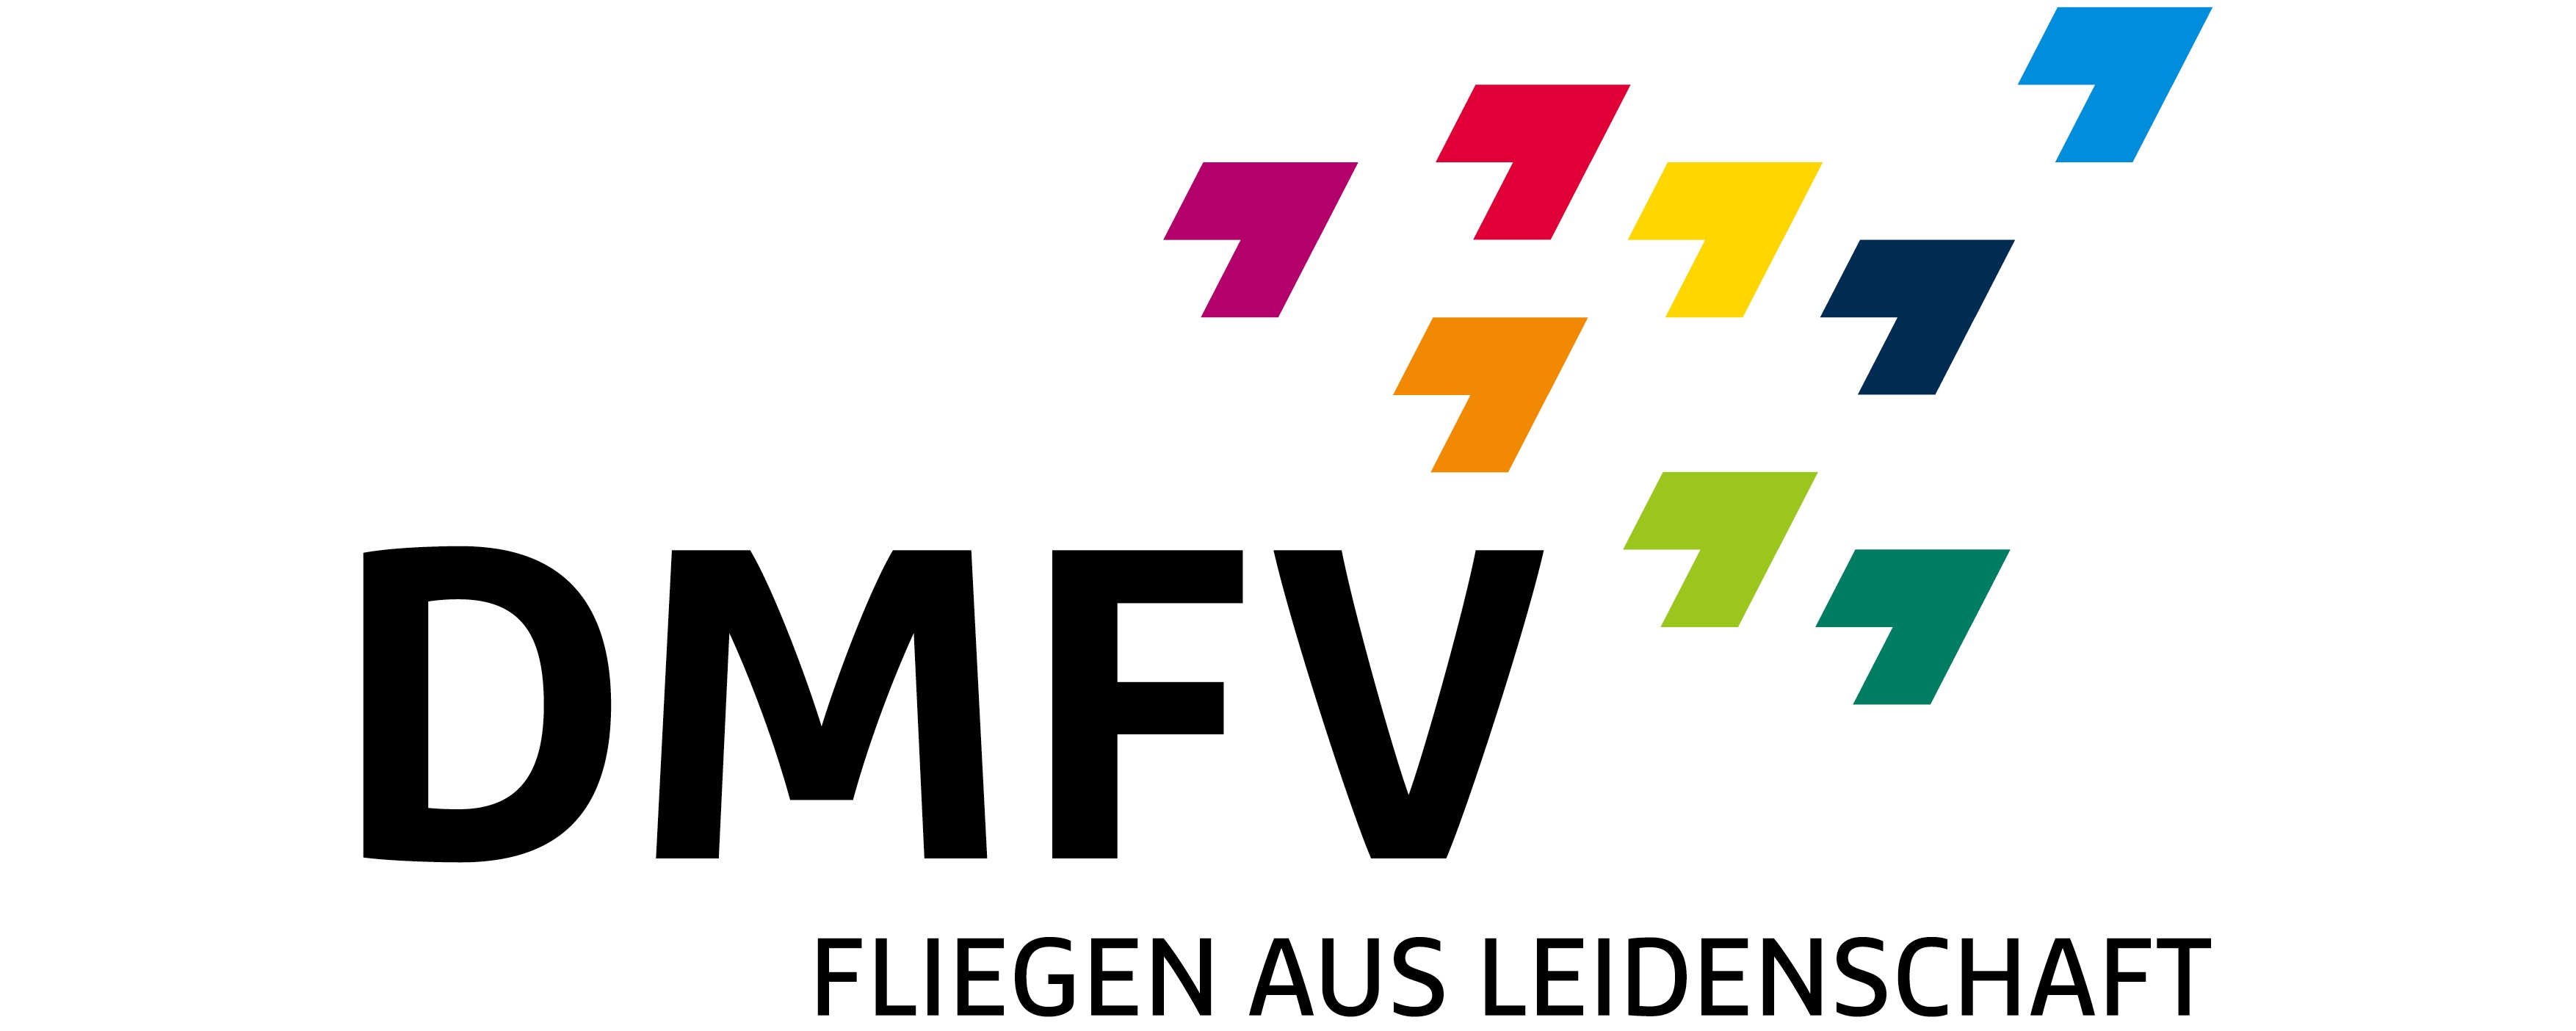 DMFV-Logo